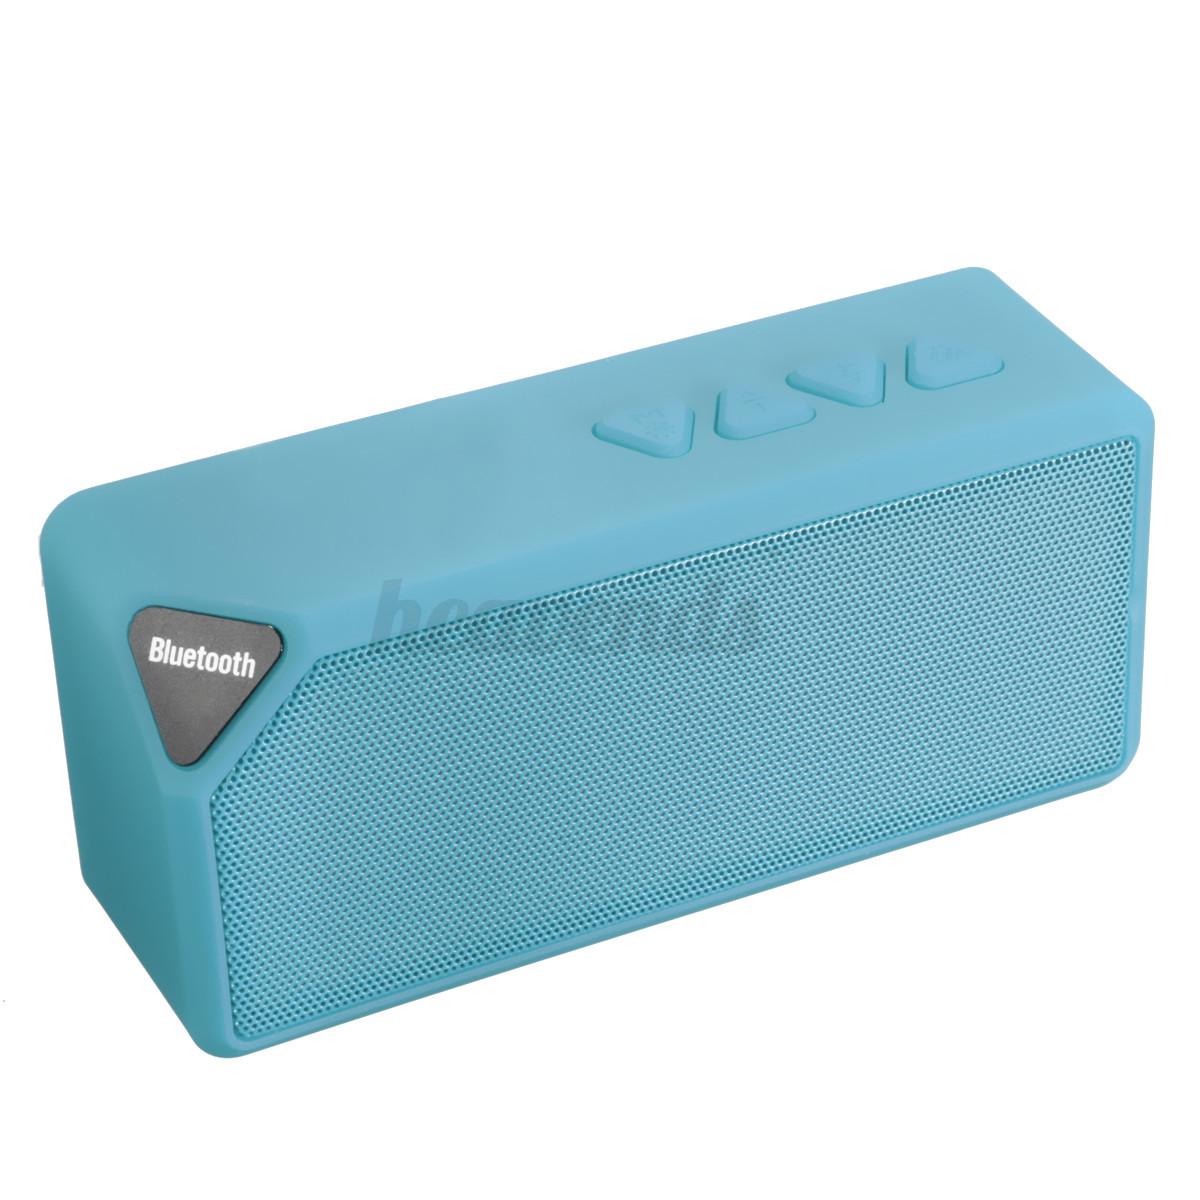 led tragbarer bluetooth lautsprecher wireless speaker. Black Bedroom Furniture Sets. Home Design Ideas